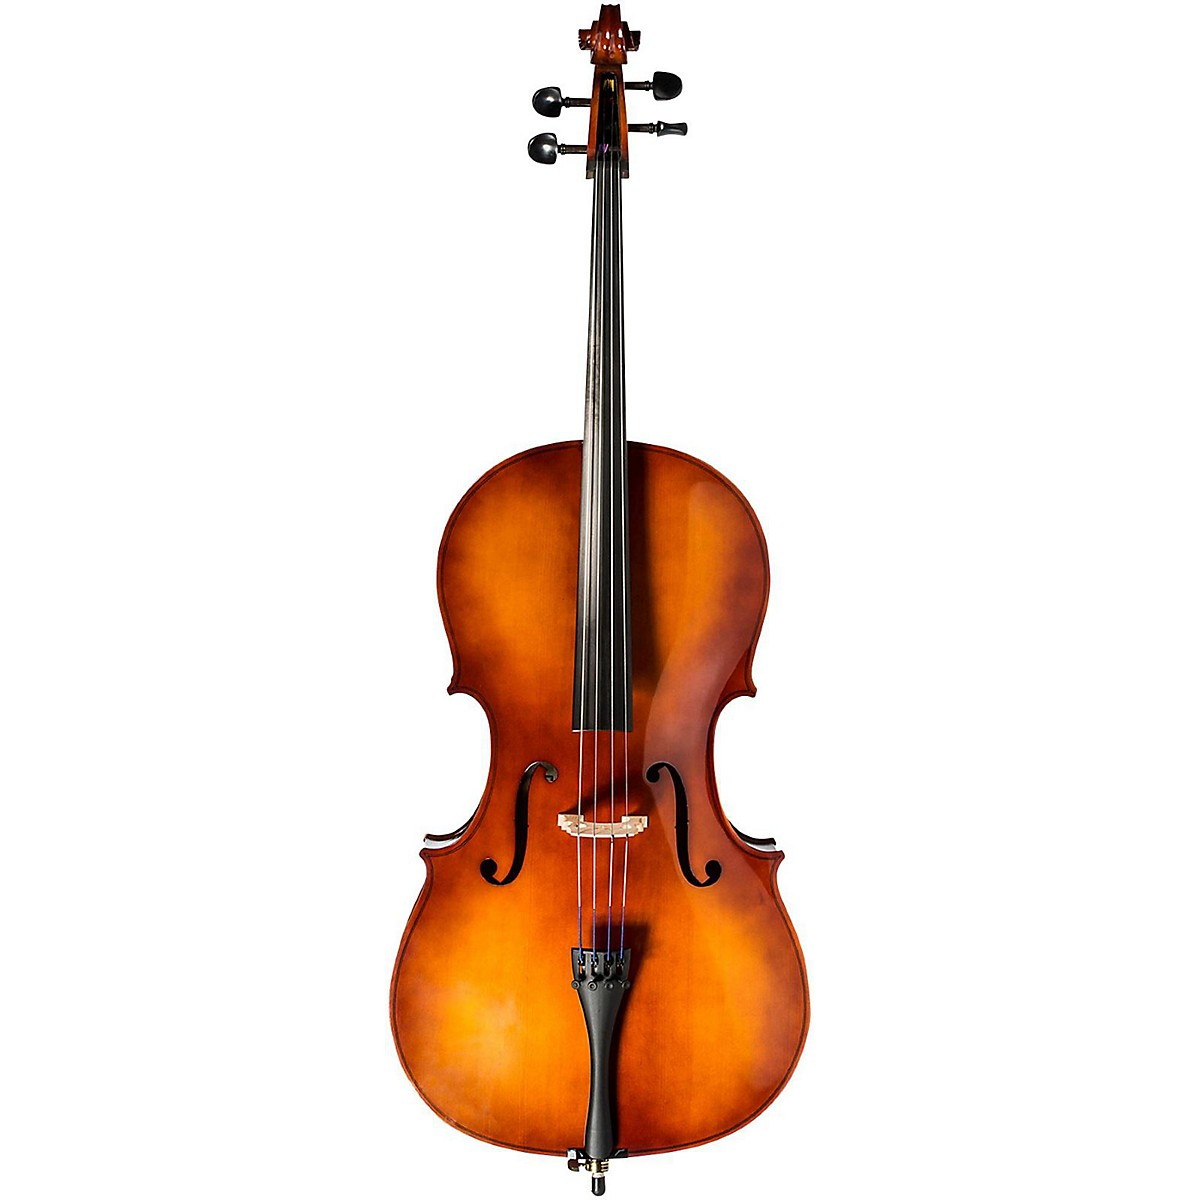 STROBEL MC-75 Student Series 3/4 Size Cello Outfit